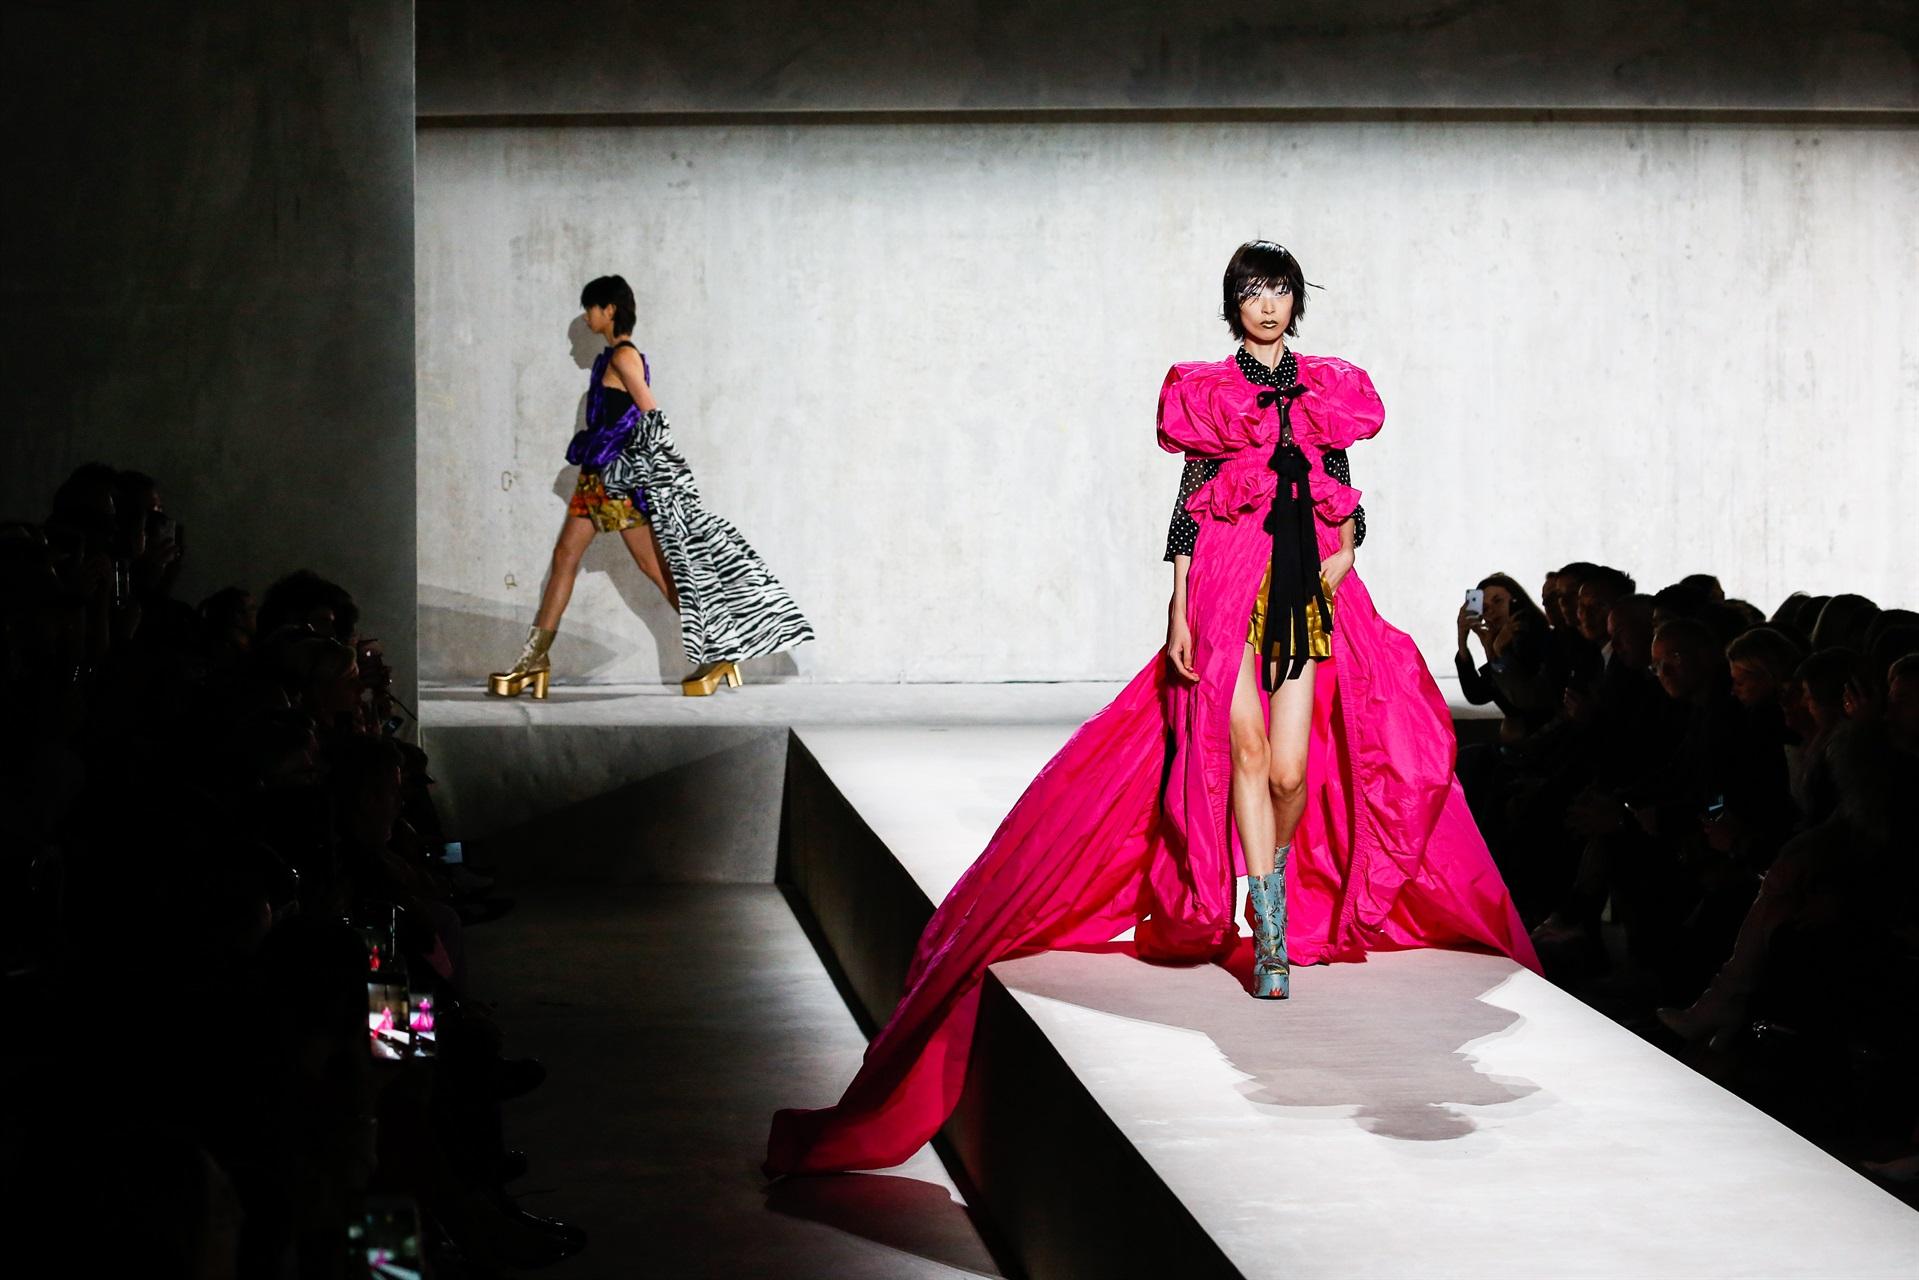 dries - La magia della Paris Fashion Week - seconda parte